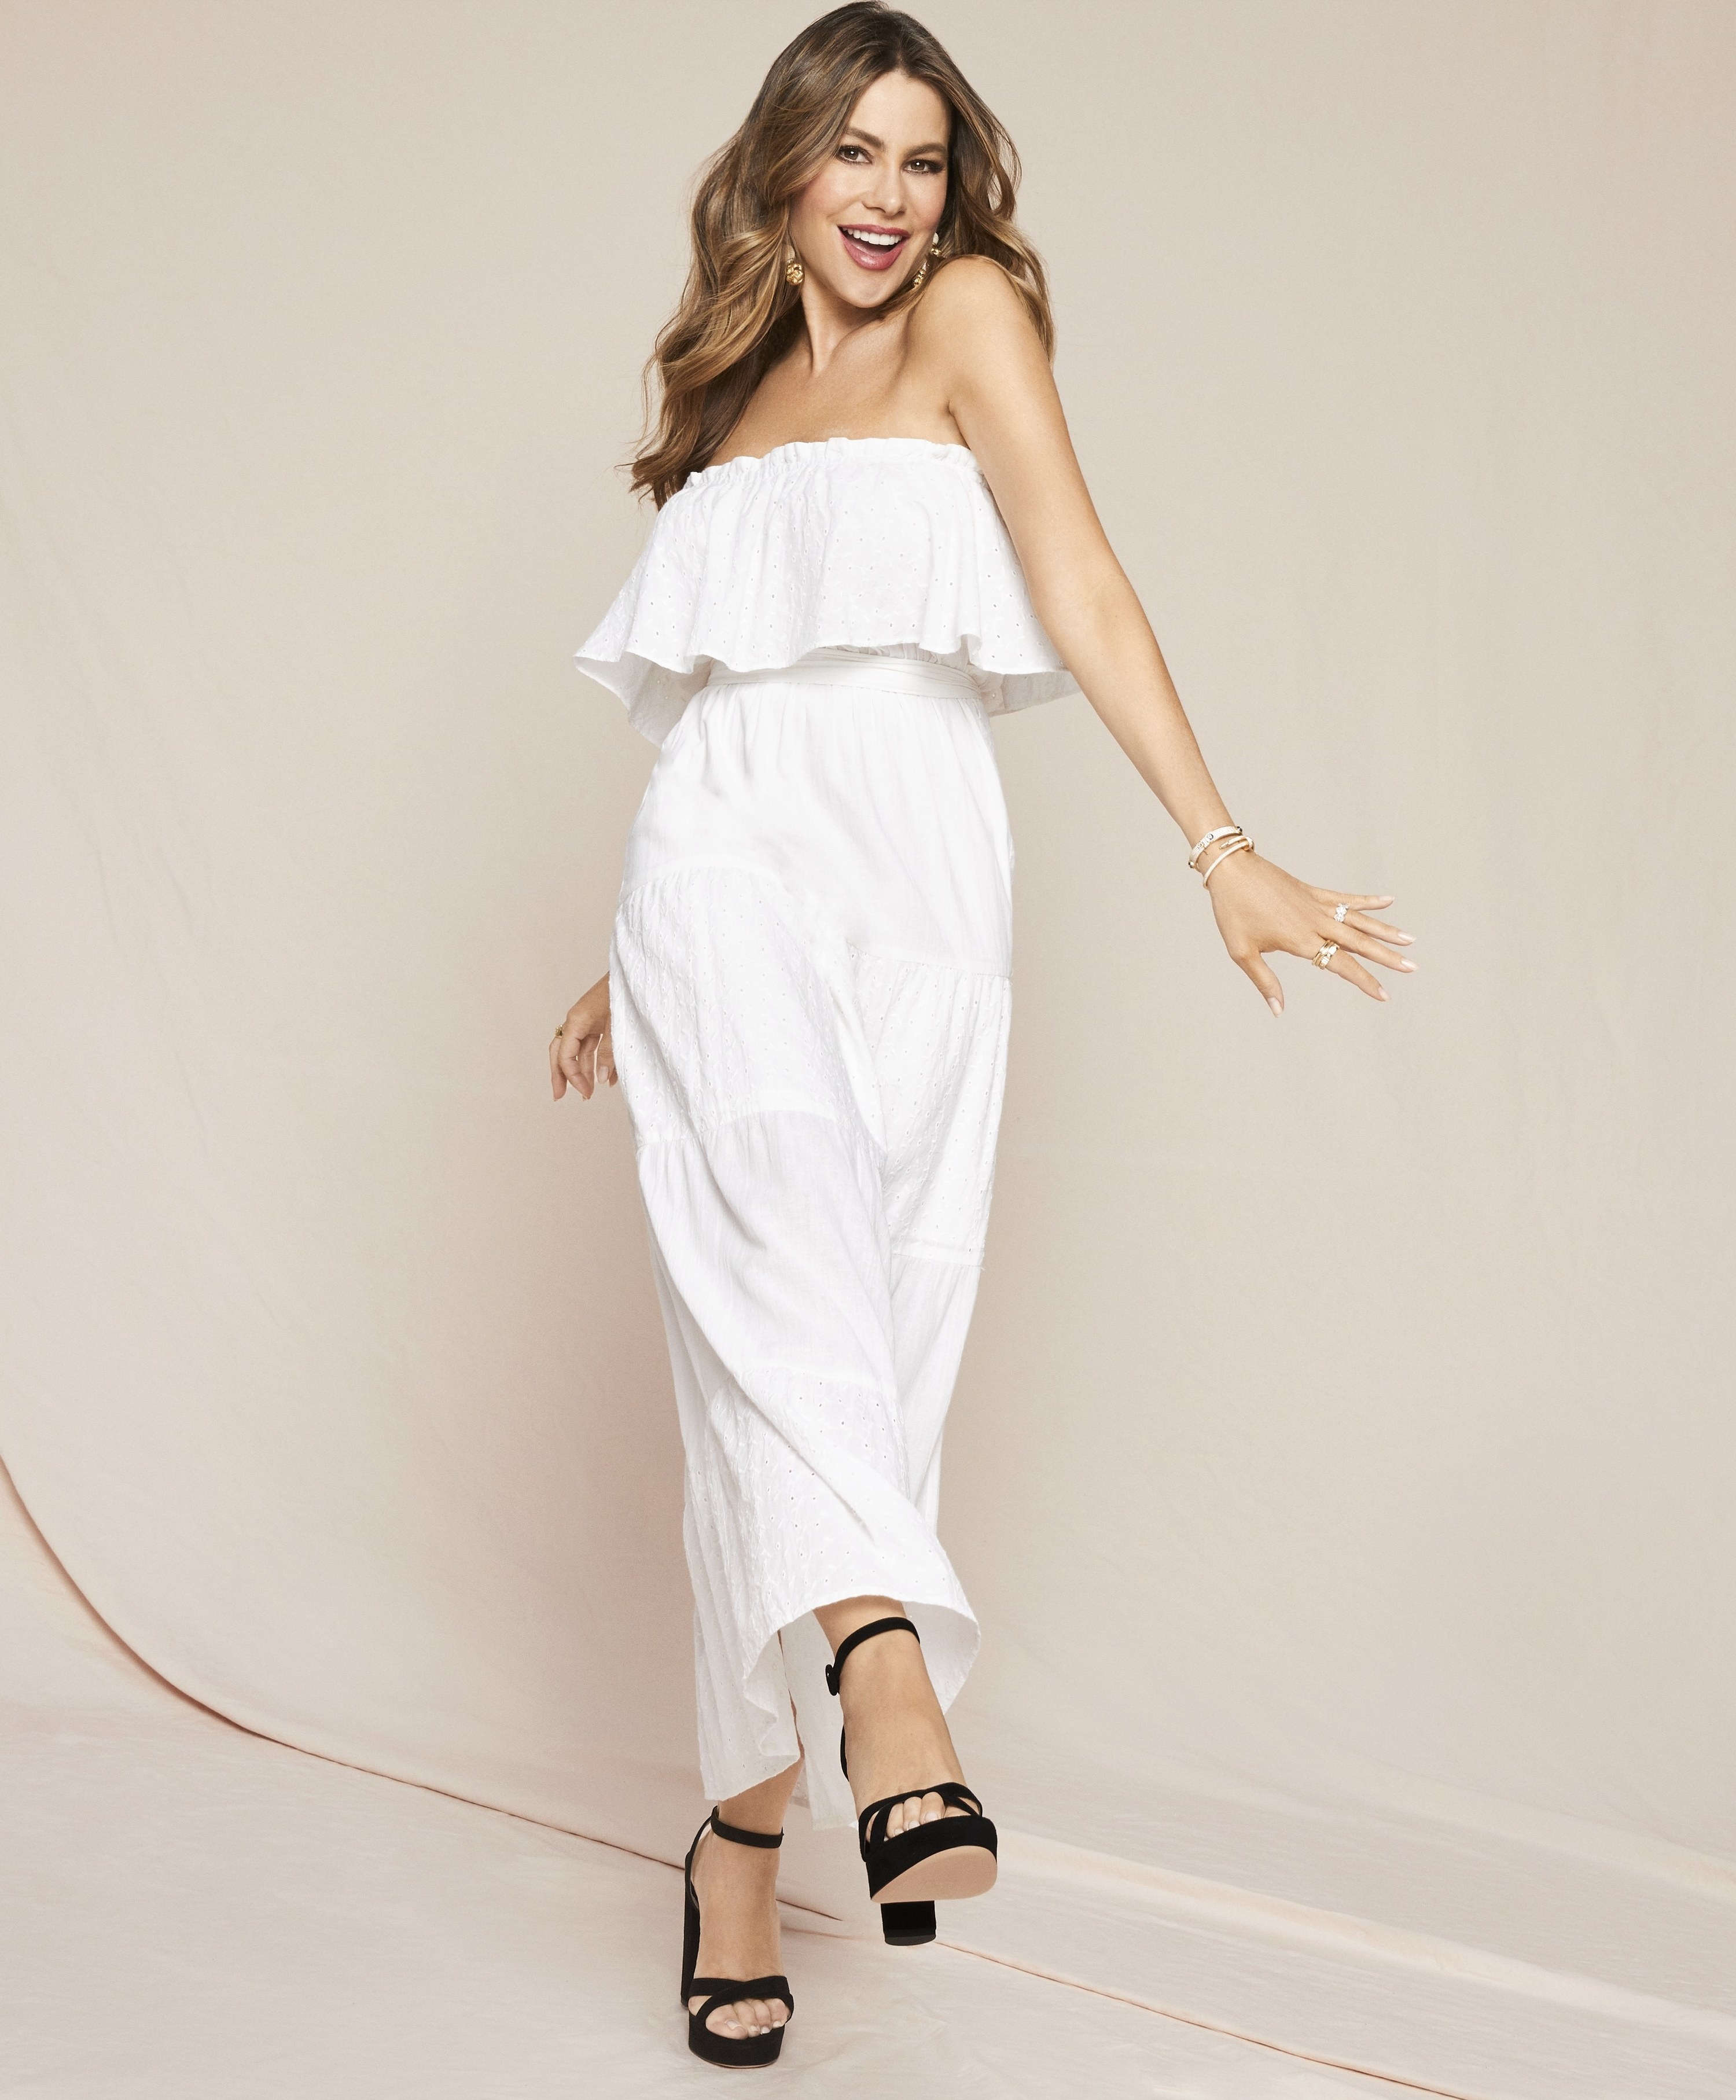 Sofia Vergara wearing white maxi dress